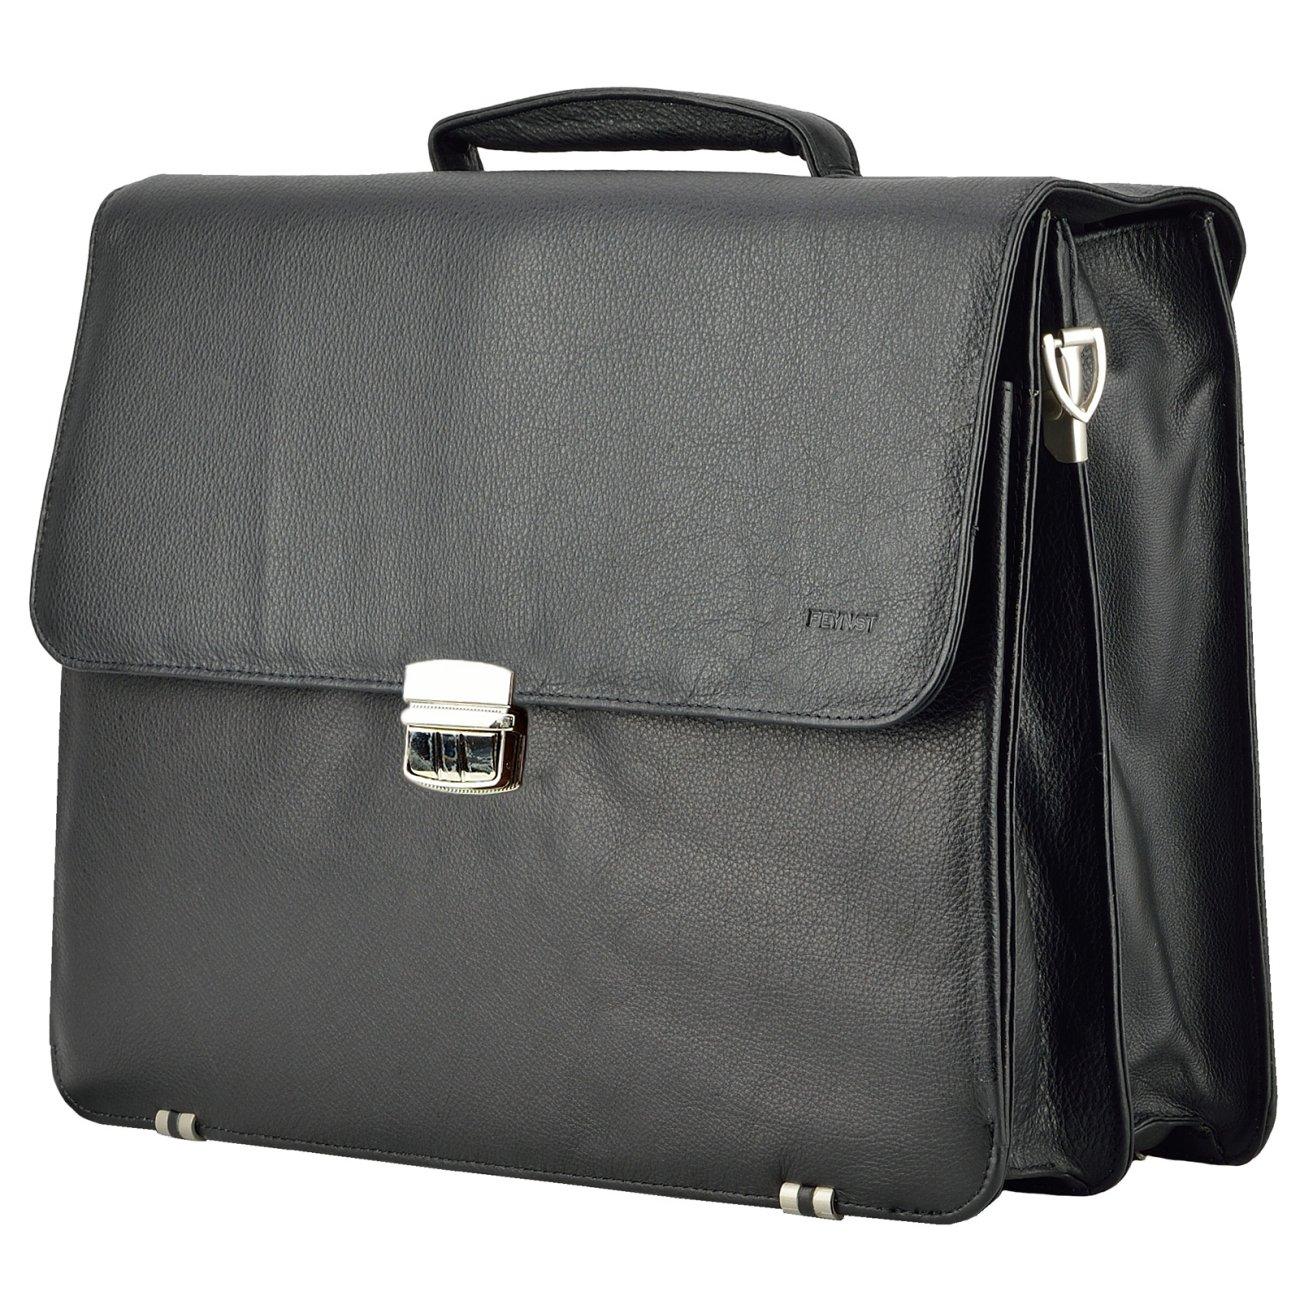 Echt Leder Messenger bag Business Tasche Aktentasche Herrentasche Schultertasche Umhängetasche DIN-A4 Laptoptasche Notebooktasche Schwarz MB-14-sw